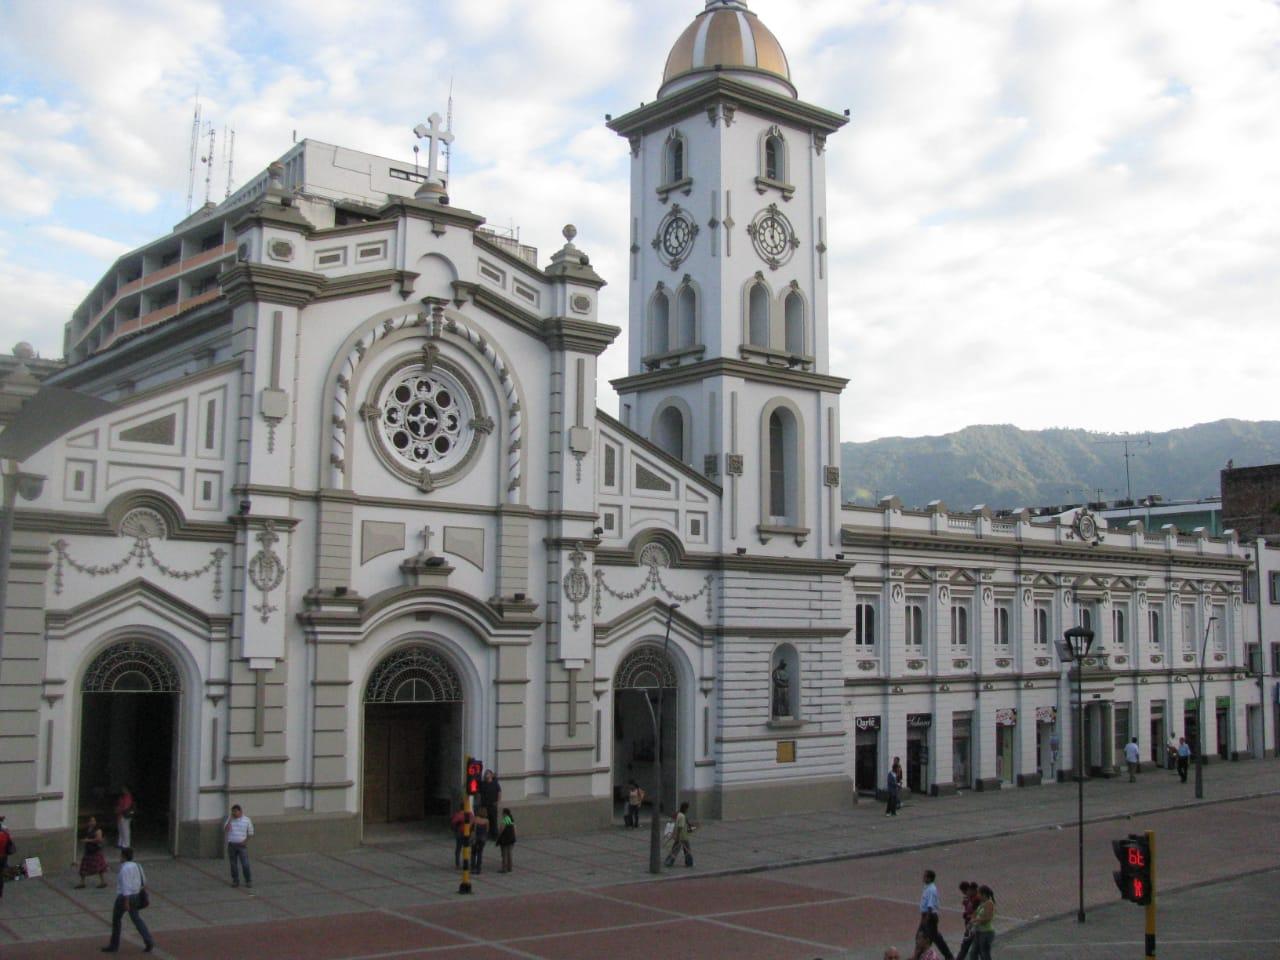 Autorizados planes piloto para la reactivar gimnasios, casinos e iglesias en Ibagué 1